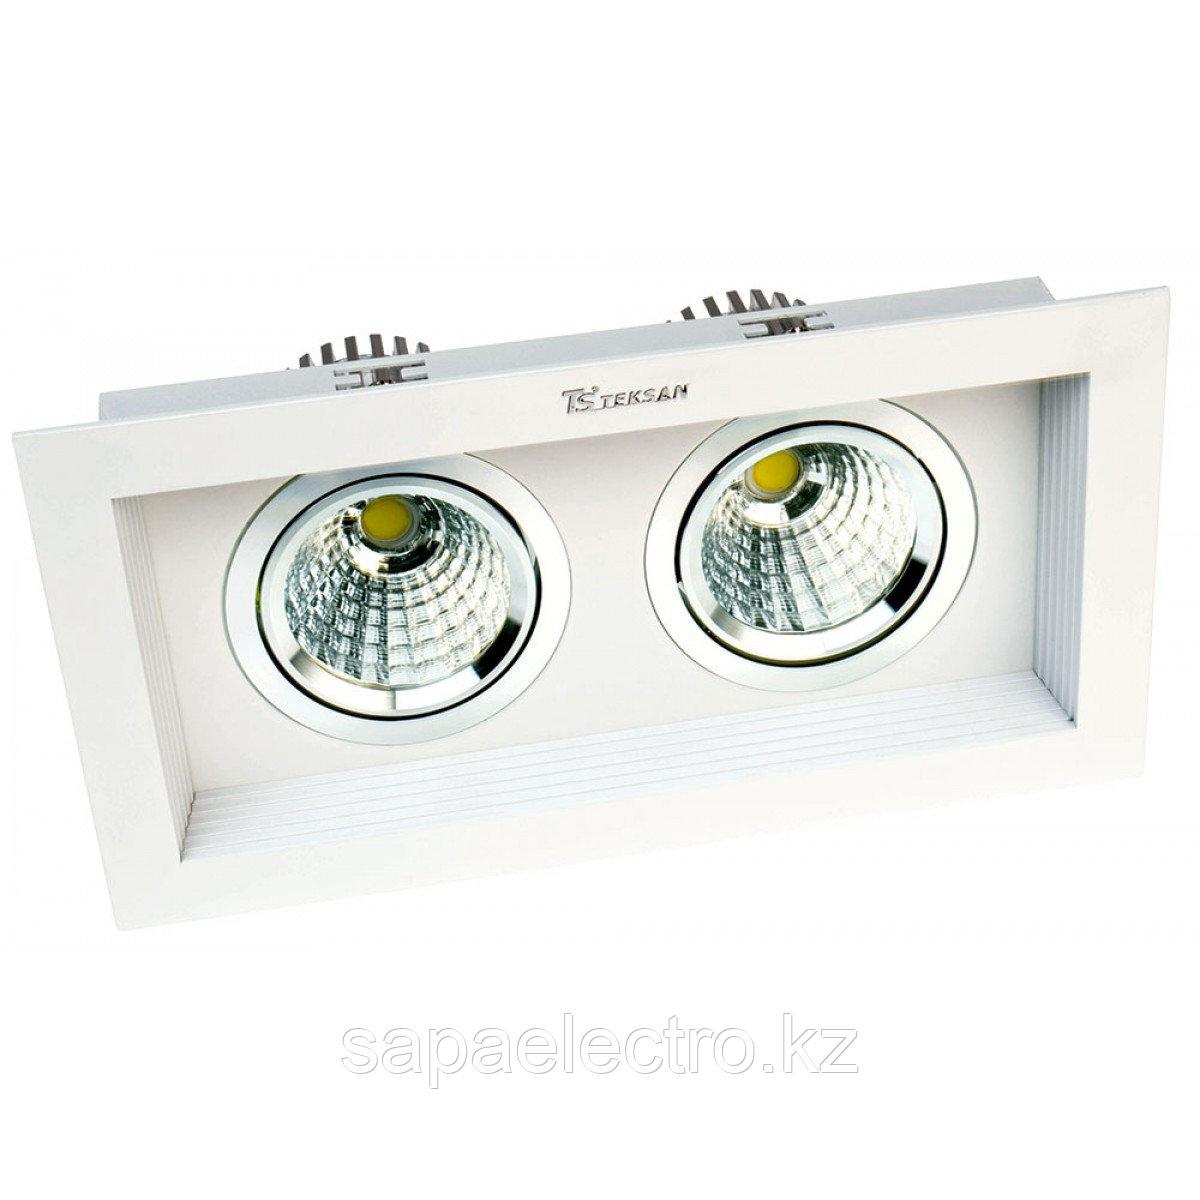 Свет-к DOWNLIGHT LED RS-2112C-2 2х10W 5700K(TS)18ш